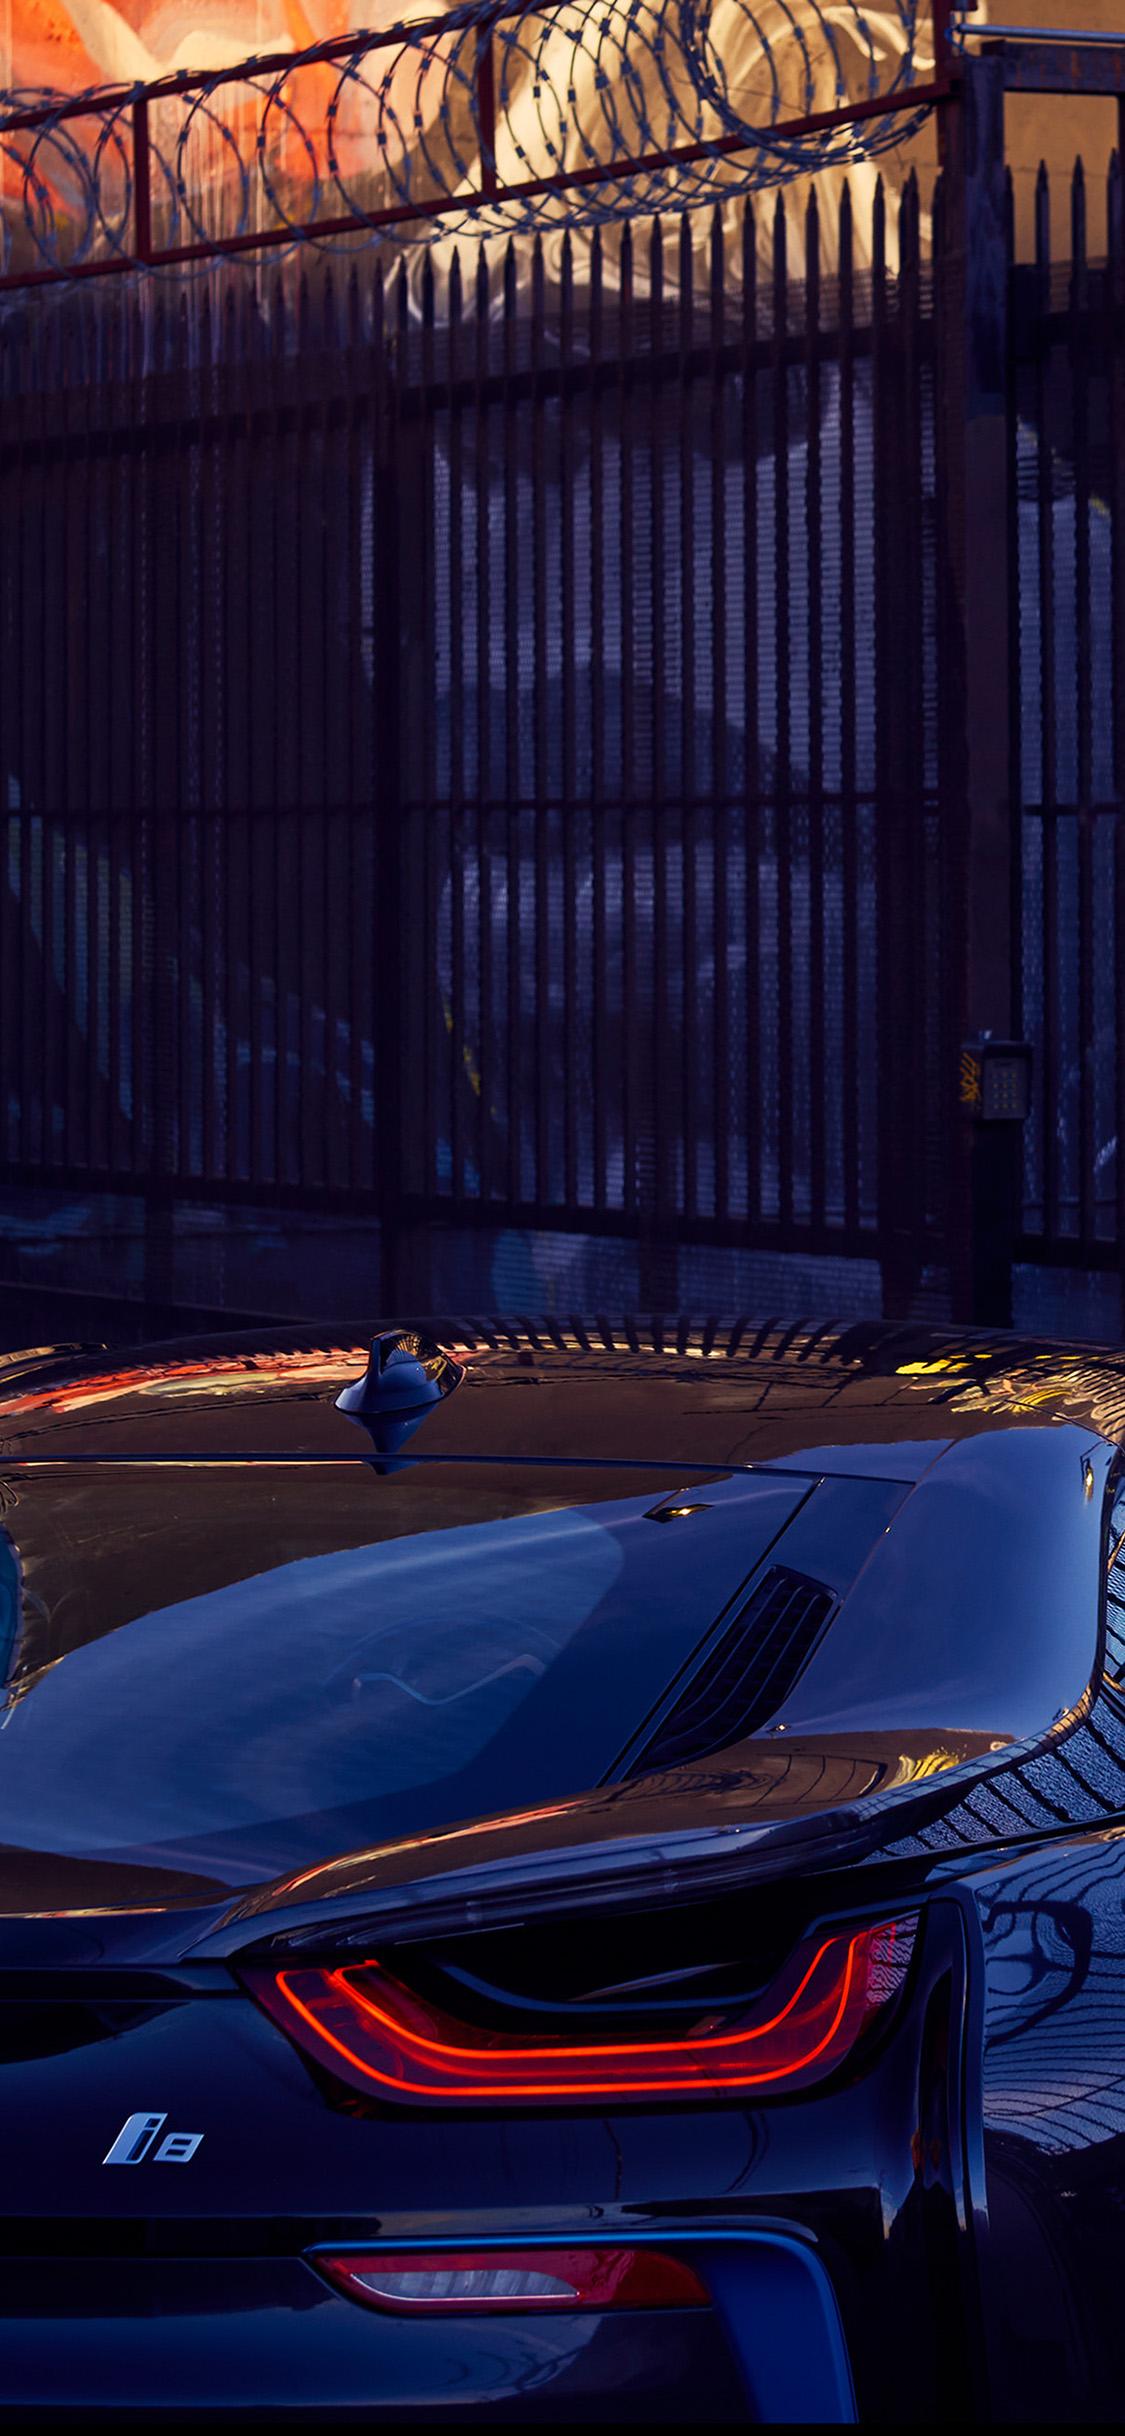 Iphone11papers Com Iphone11 Wallpaper Bk58 Art Car Bmw Blue Reflection